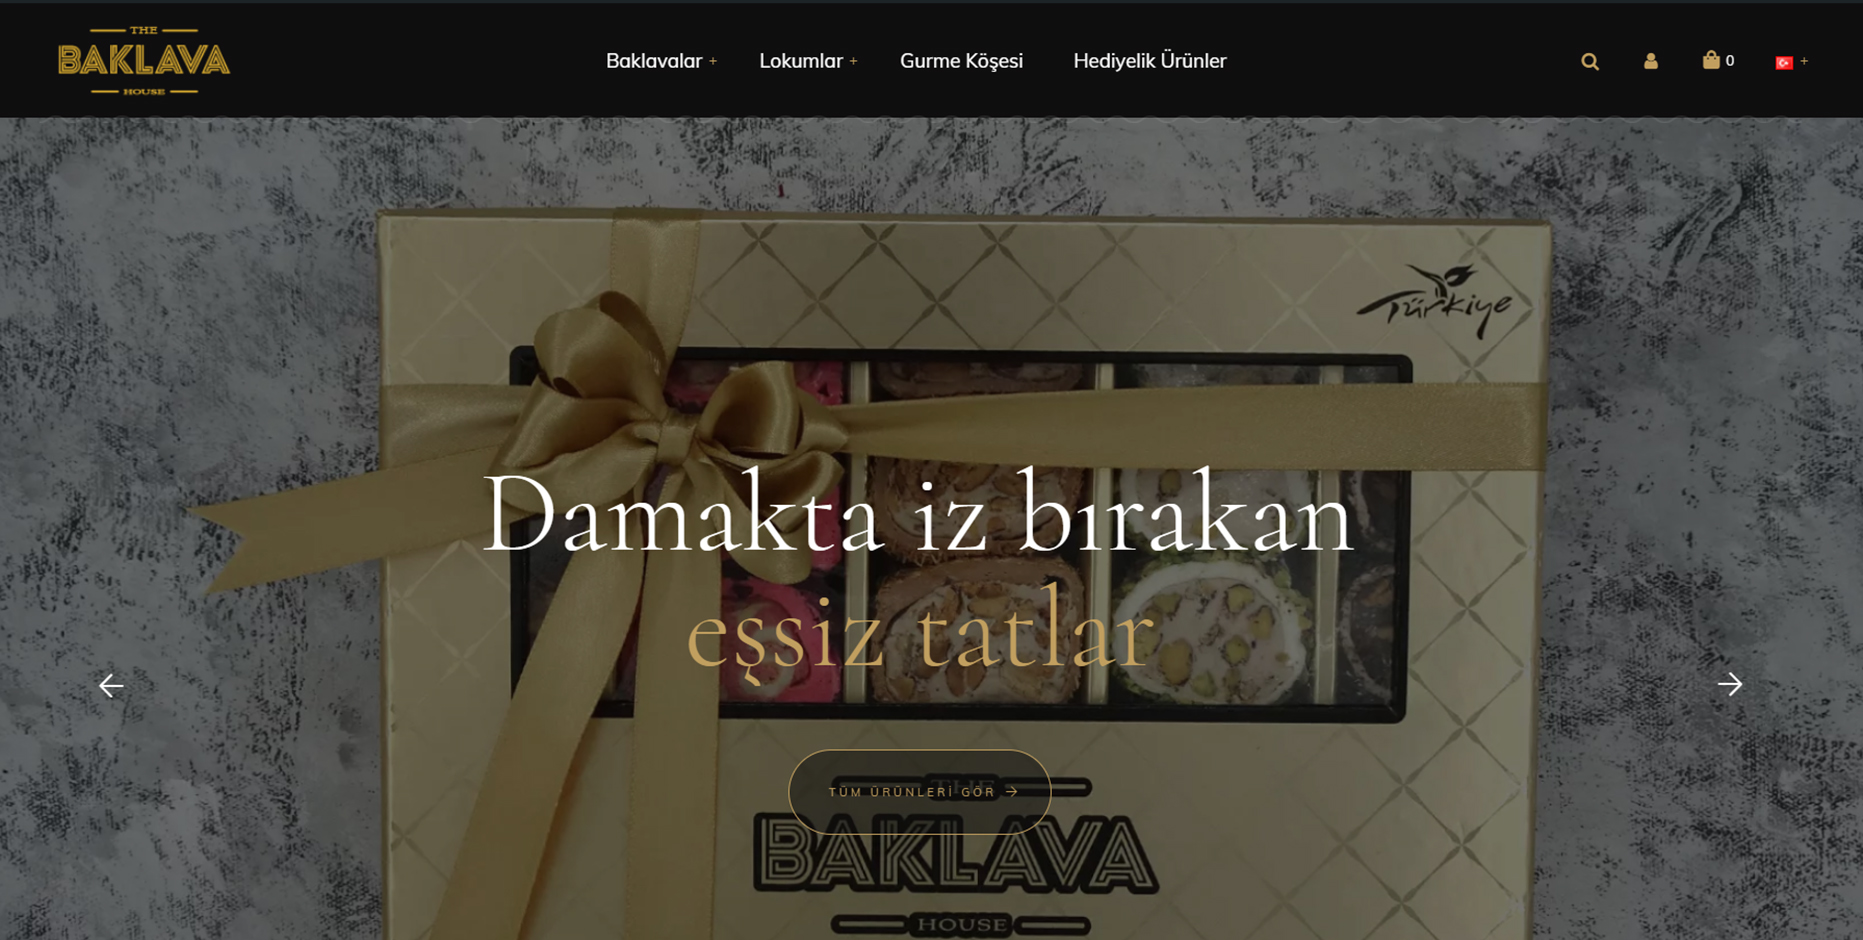 The Baklava House